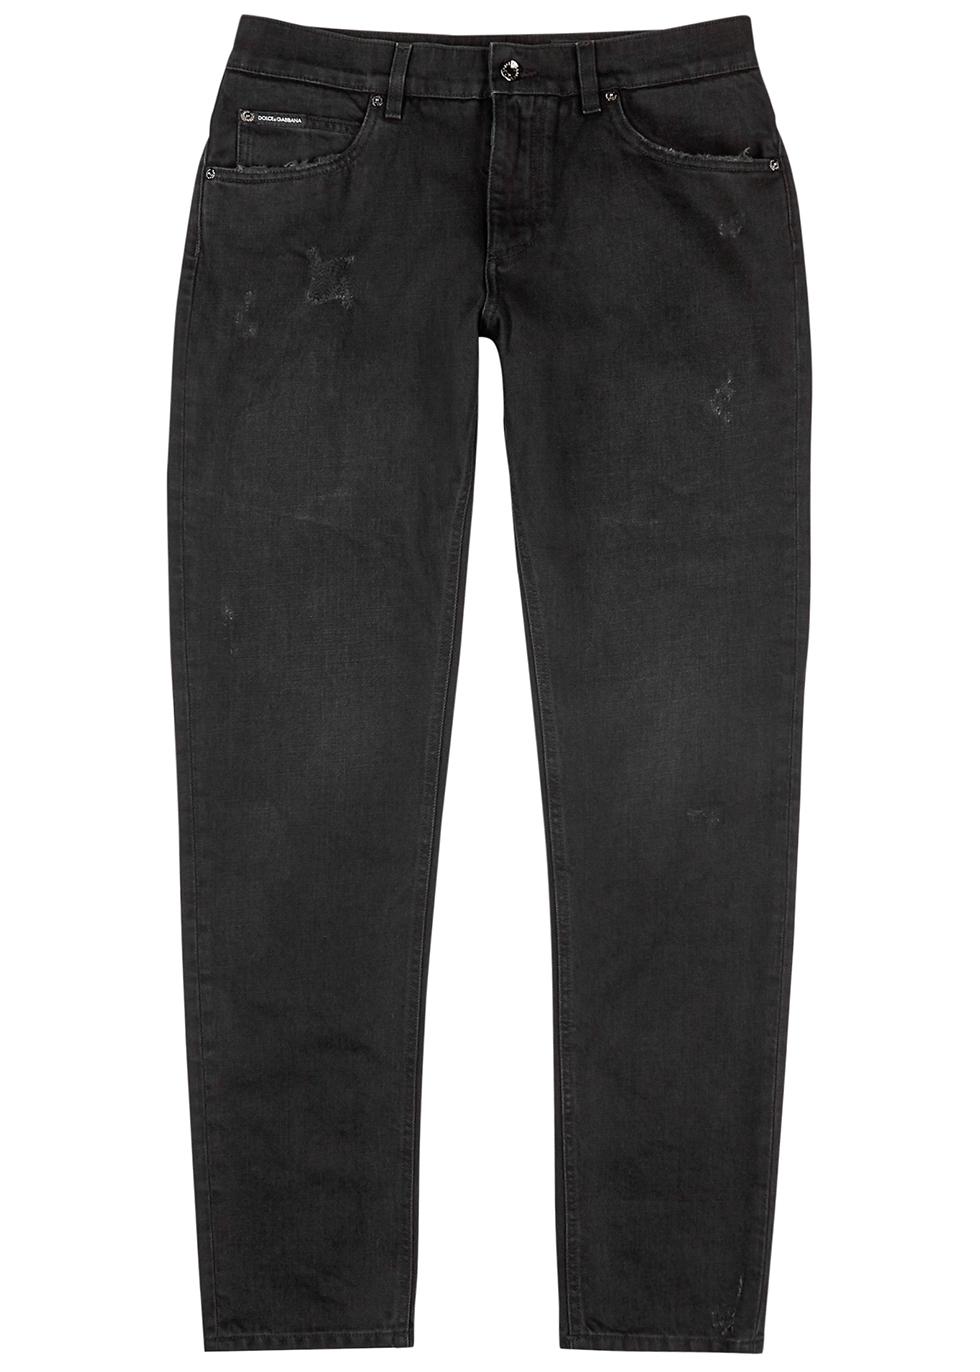 Black slim-leg jeans